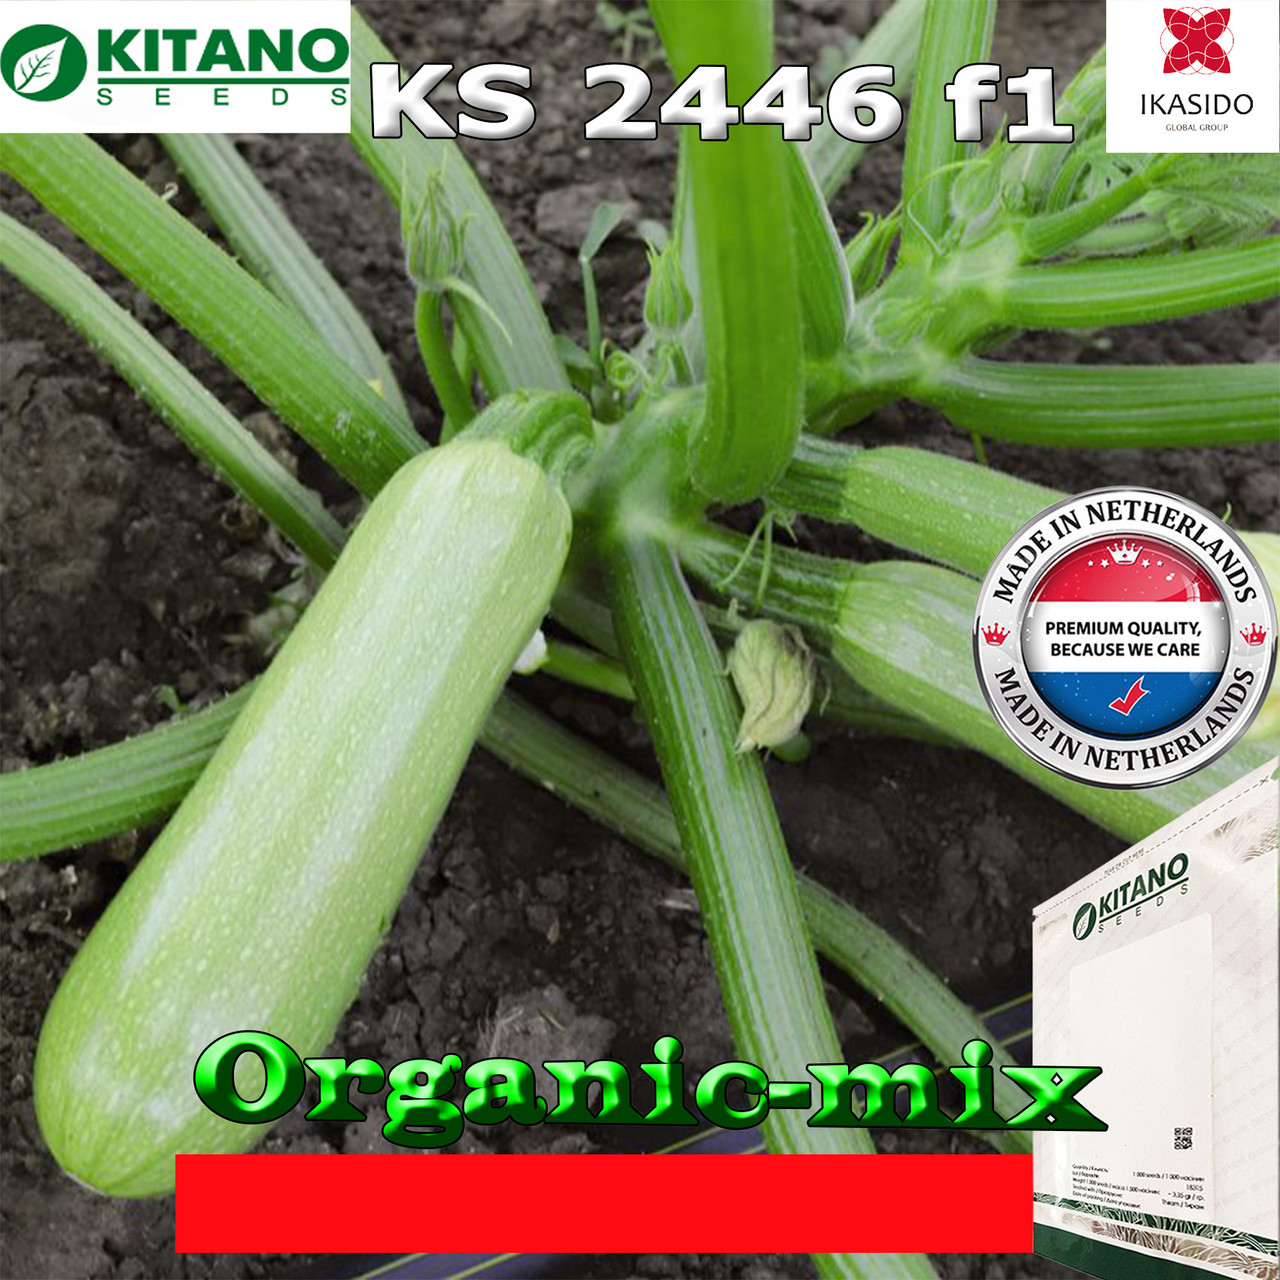 Кабачок пластичный ранний KS 2446 F1, 1000 семян, ТМ Kitano Seeds